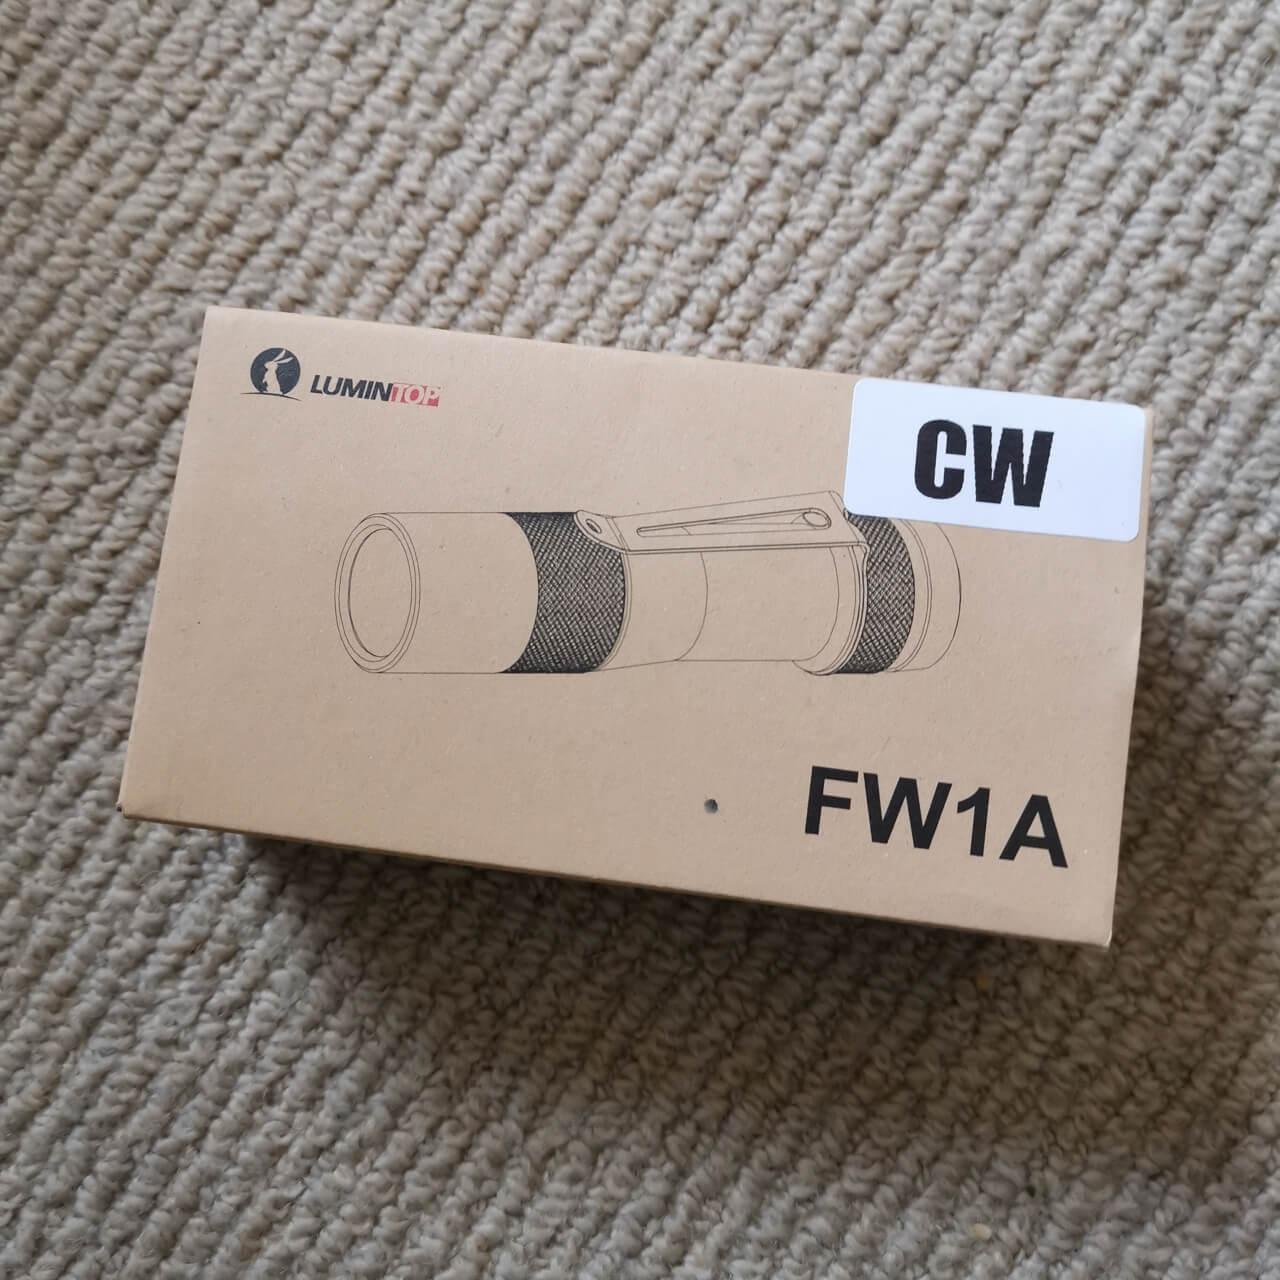 Lumintop FW1A Box